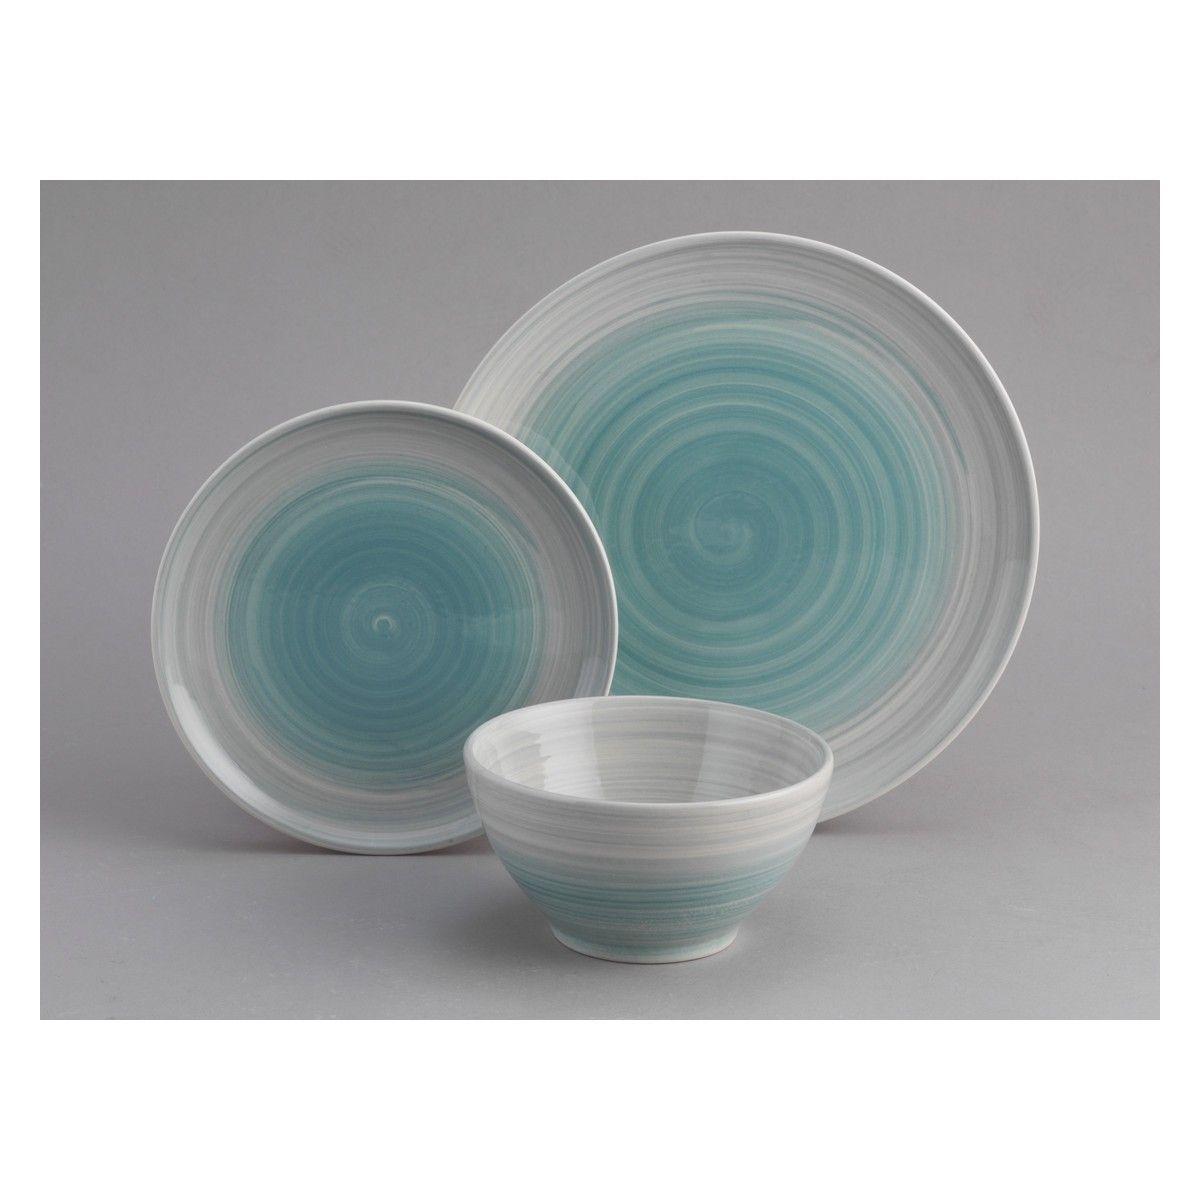 ATKINSON Blue swirl 12 piece dinner set